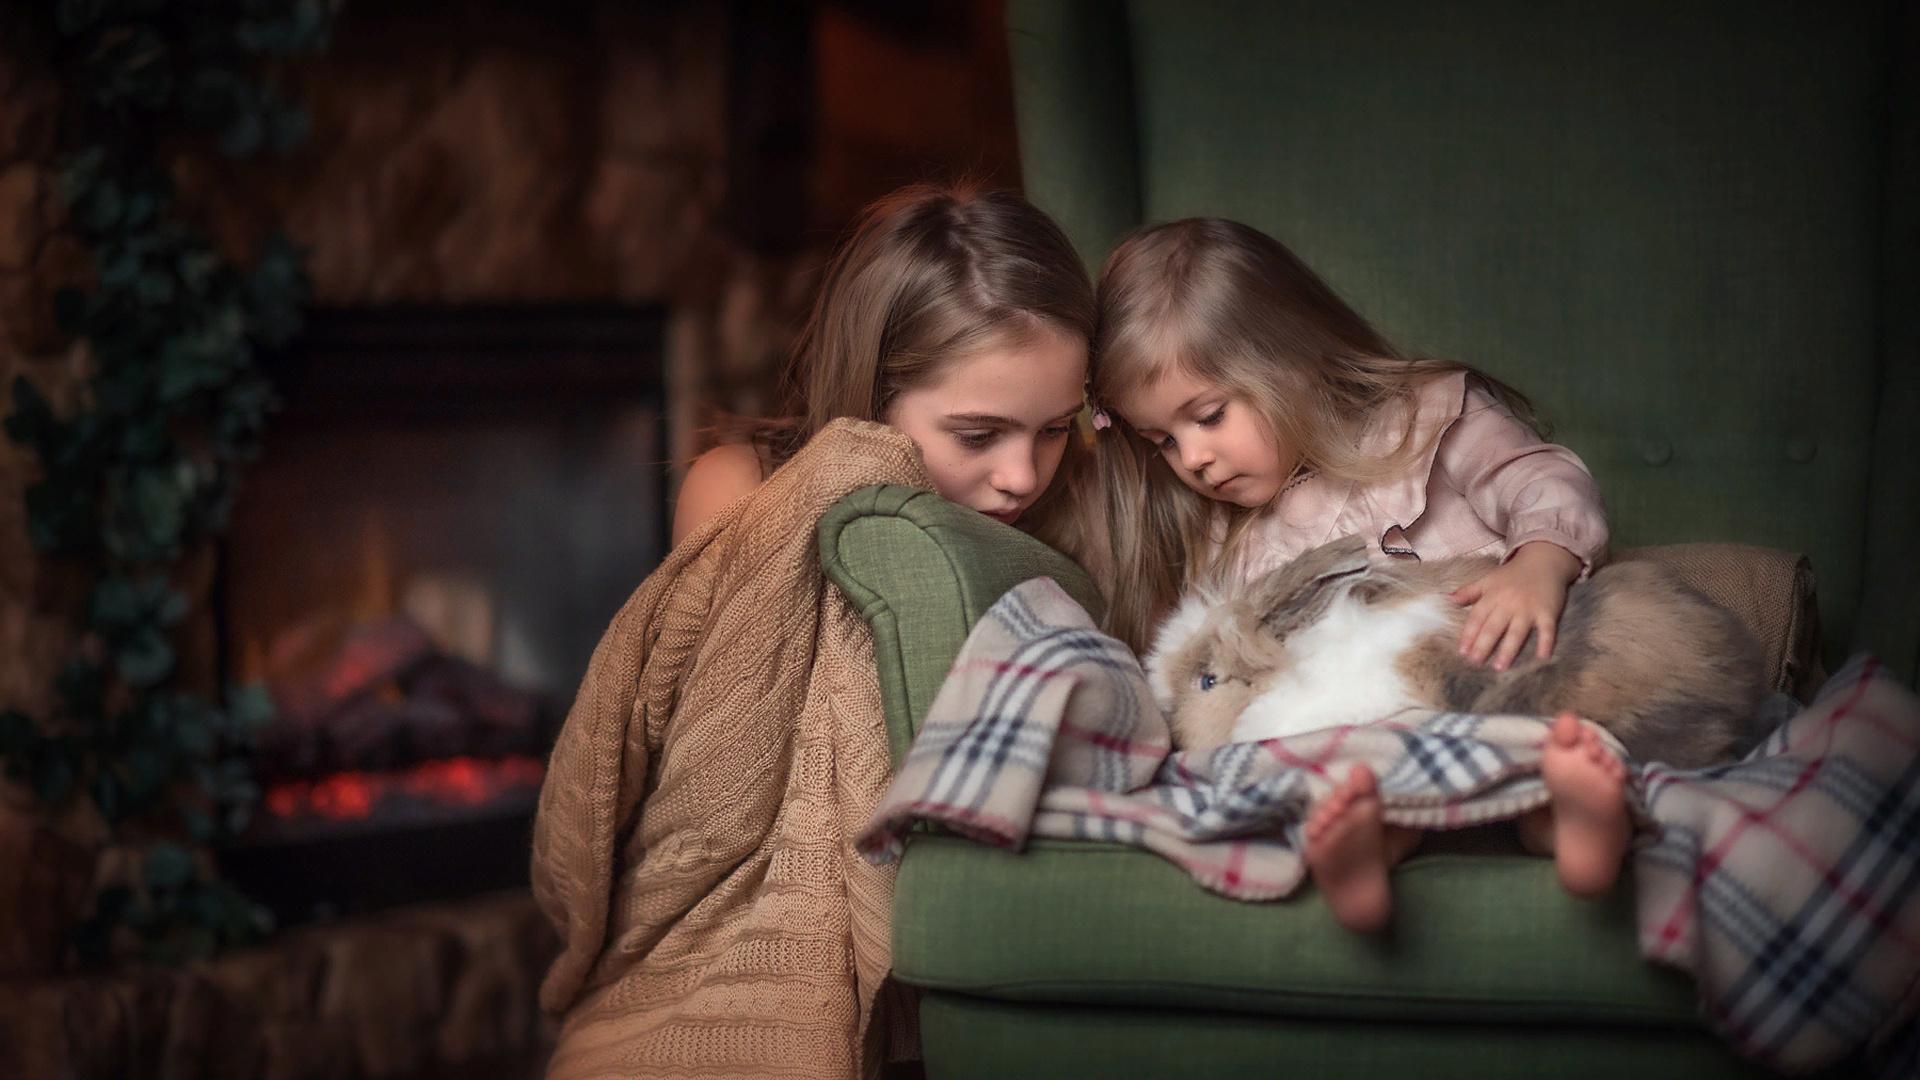 юлия таратынова, дети, девочки, комната, кресло, камин, плед, животное, кролик, питомец